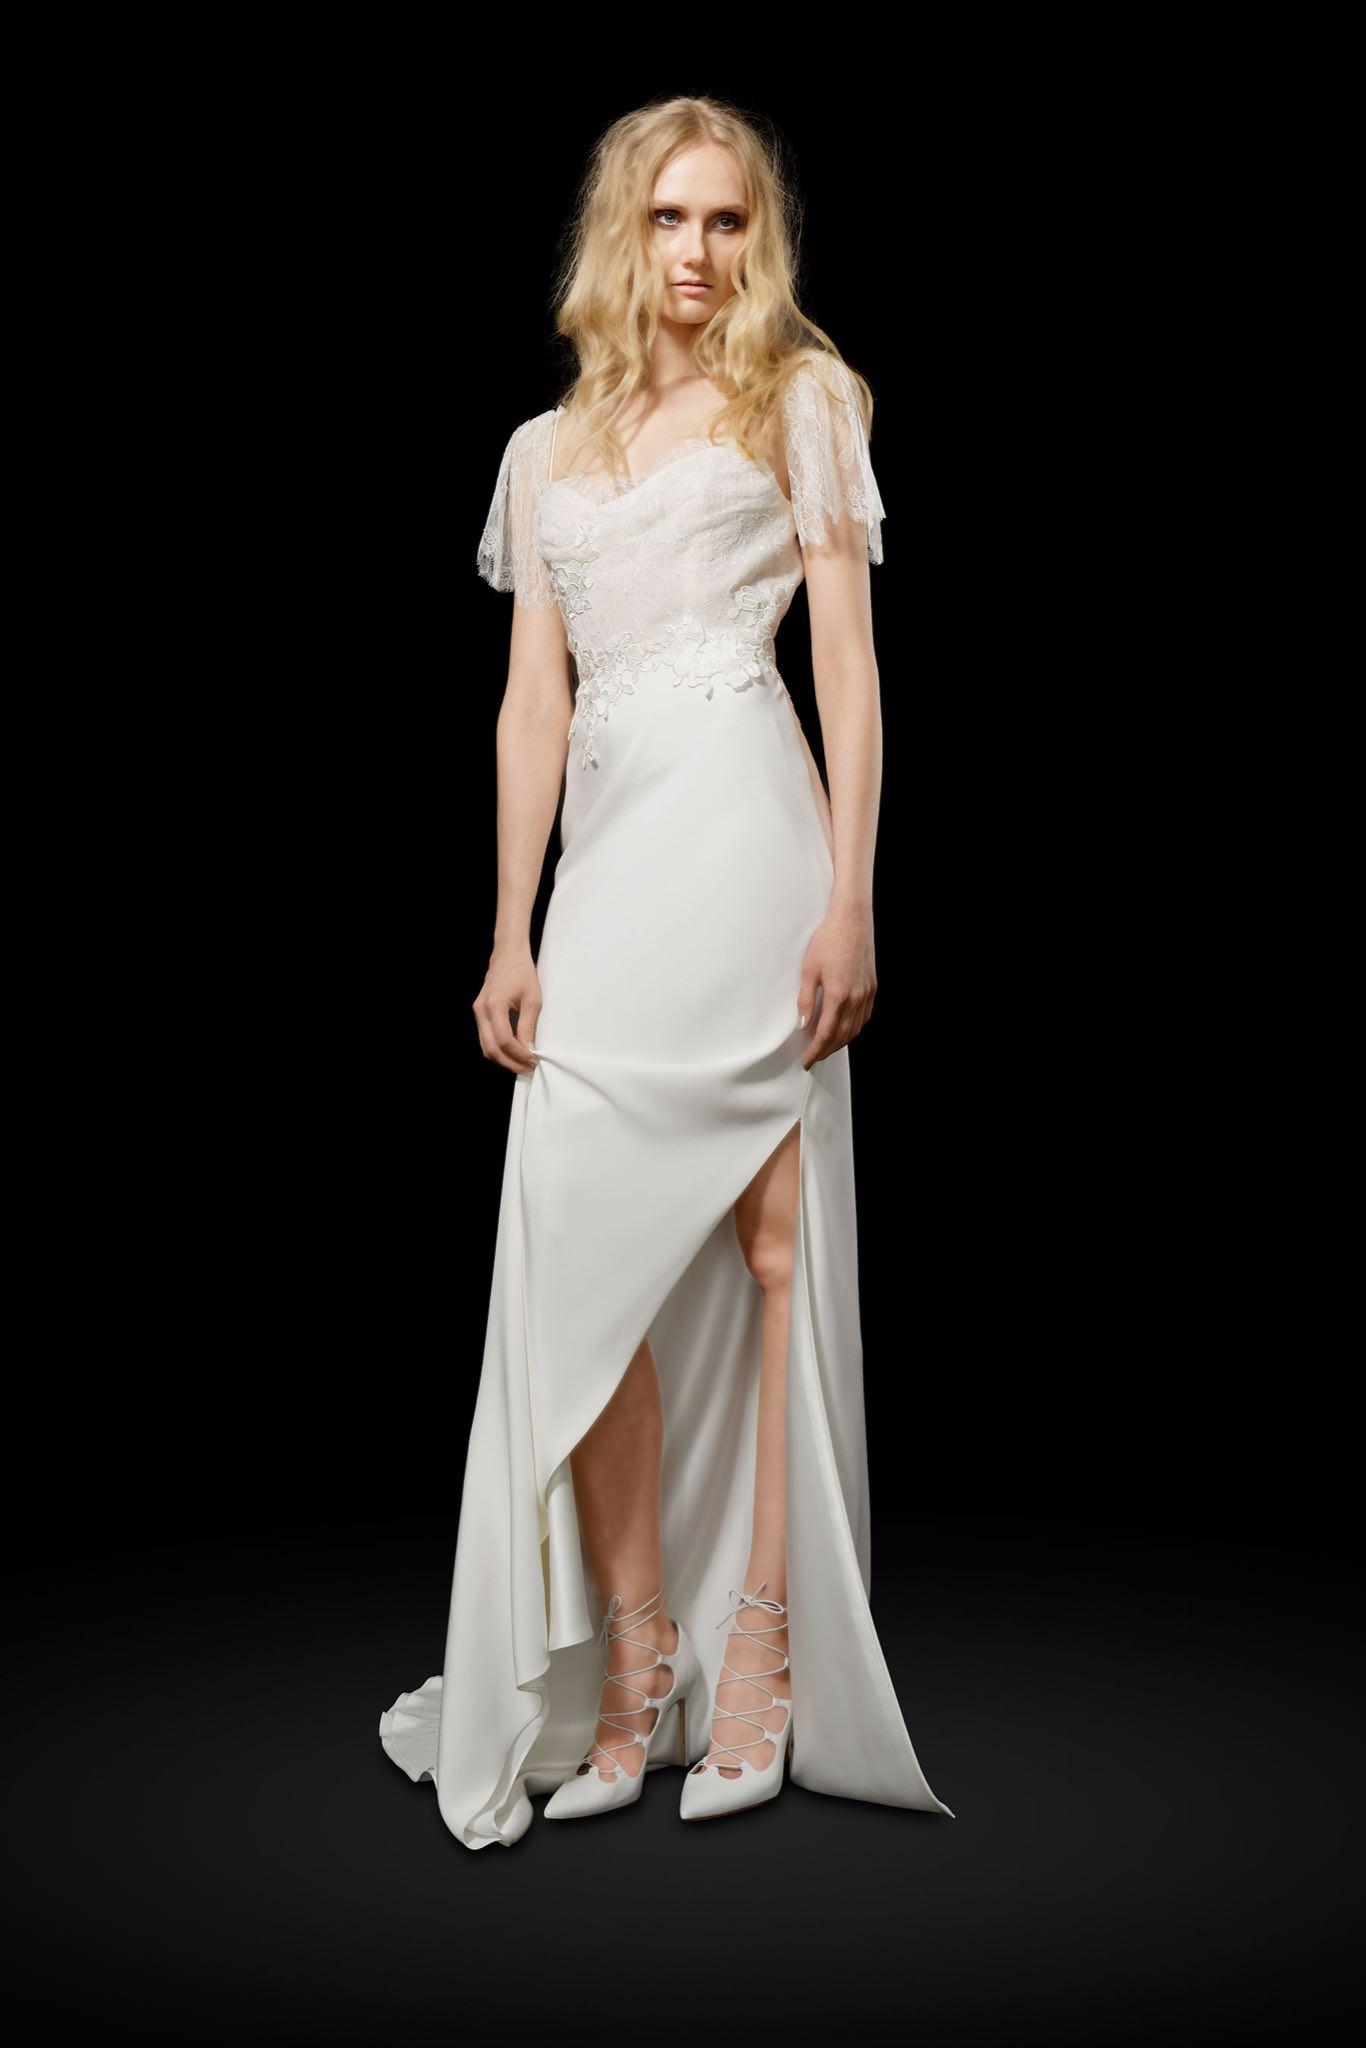 Elizabeth Fillmore Whisper wedding dress - Browns Bride